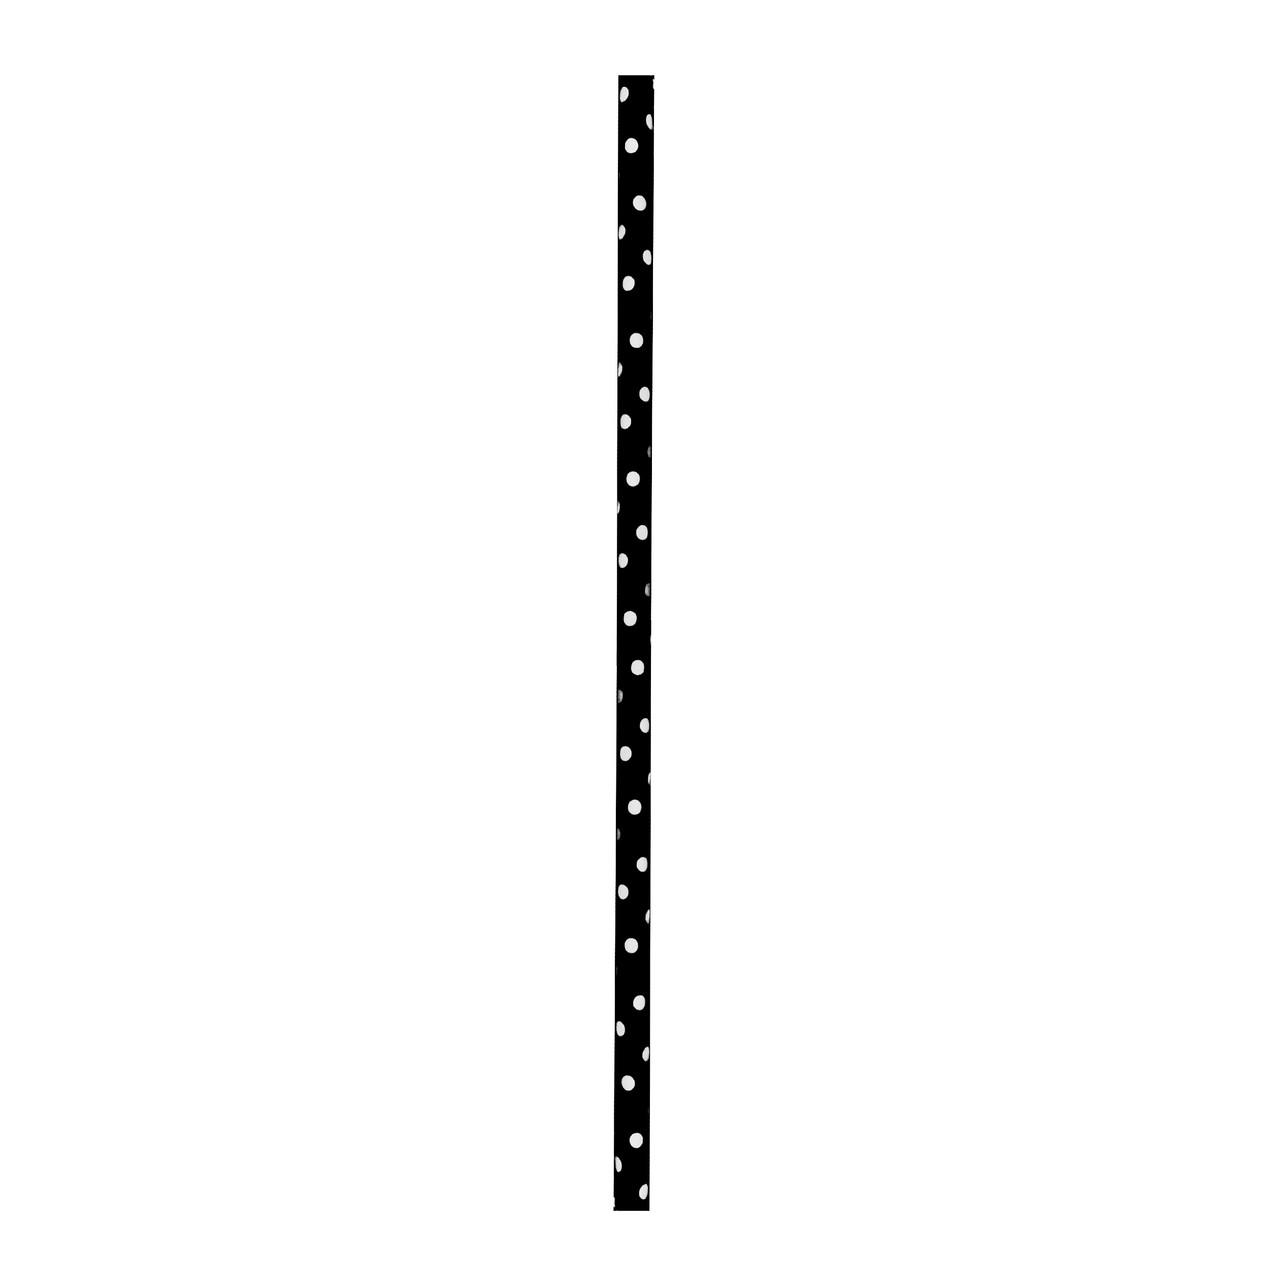 Durable Black & White Paper Straws Unwrapped - Dia:.23in L:7.75in